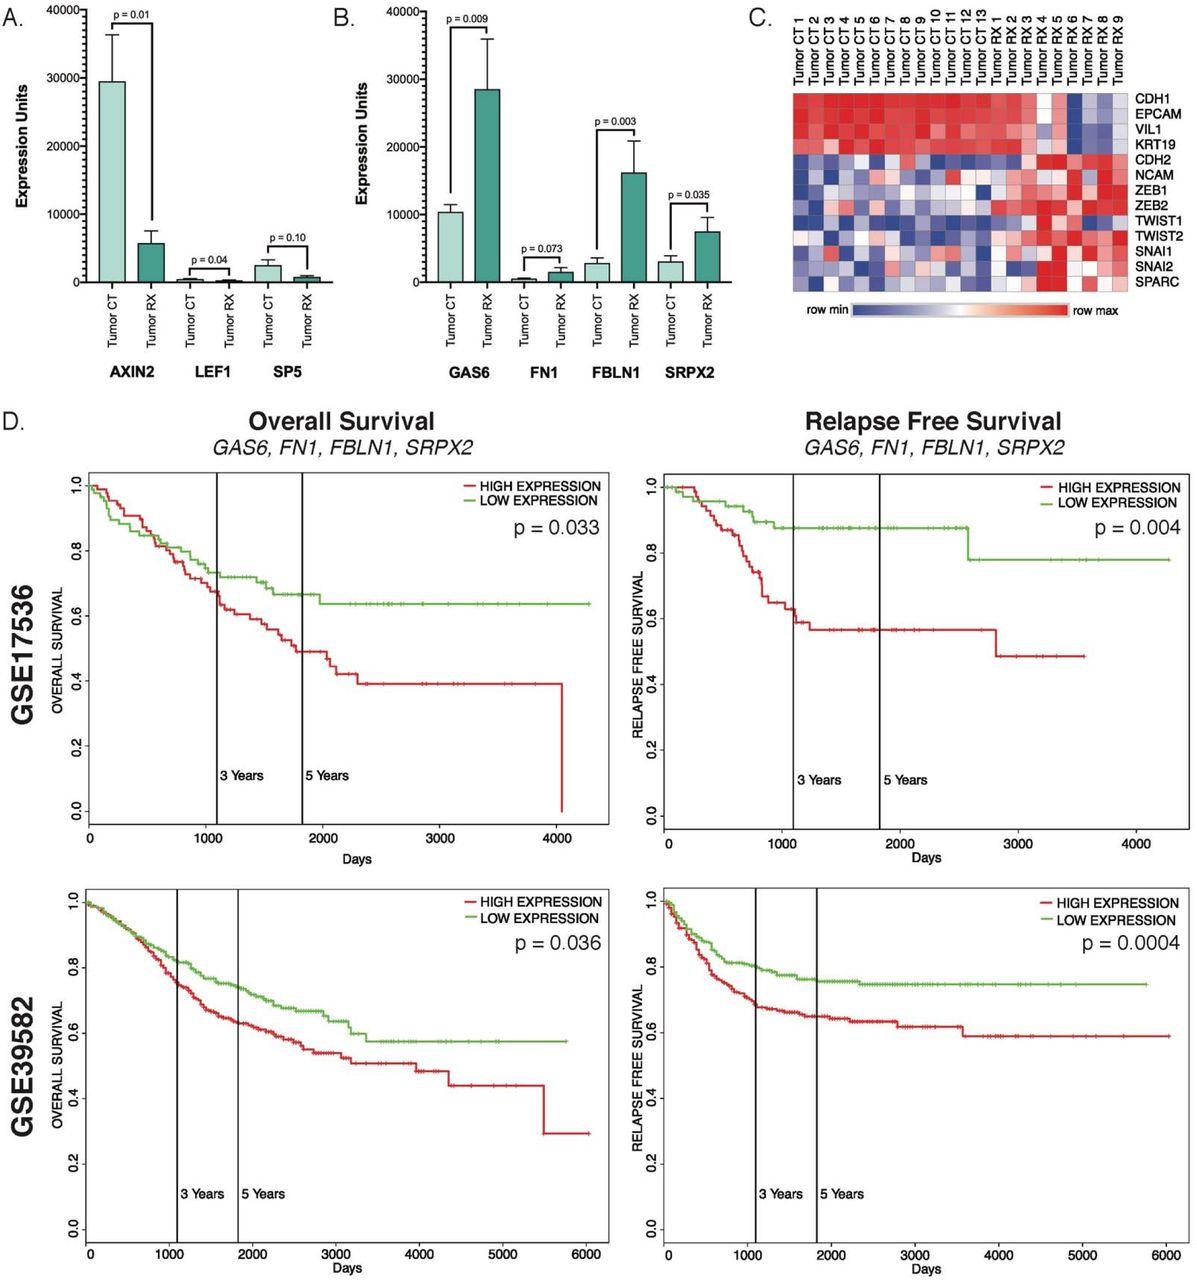 Disrupting Ss Catenin Dependent Wnt Signaling Activates An Invasive Gene Program Predictive Of Colon Cancer Progression Biorxiv